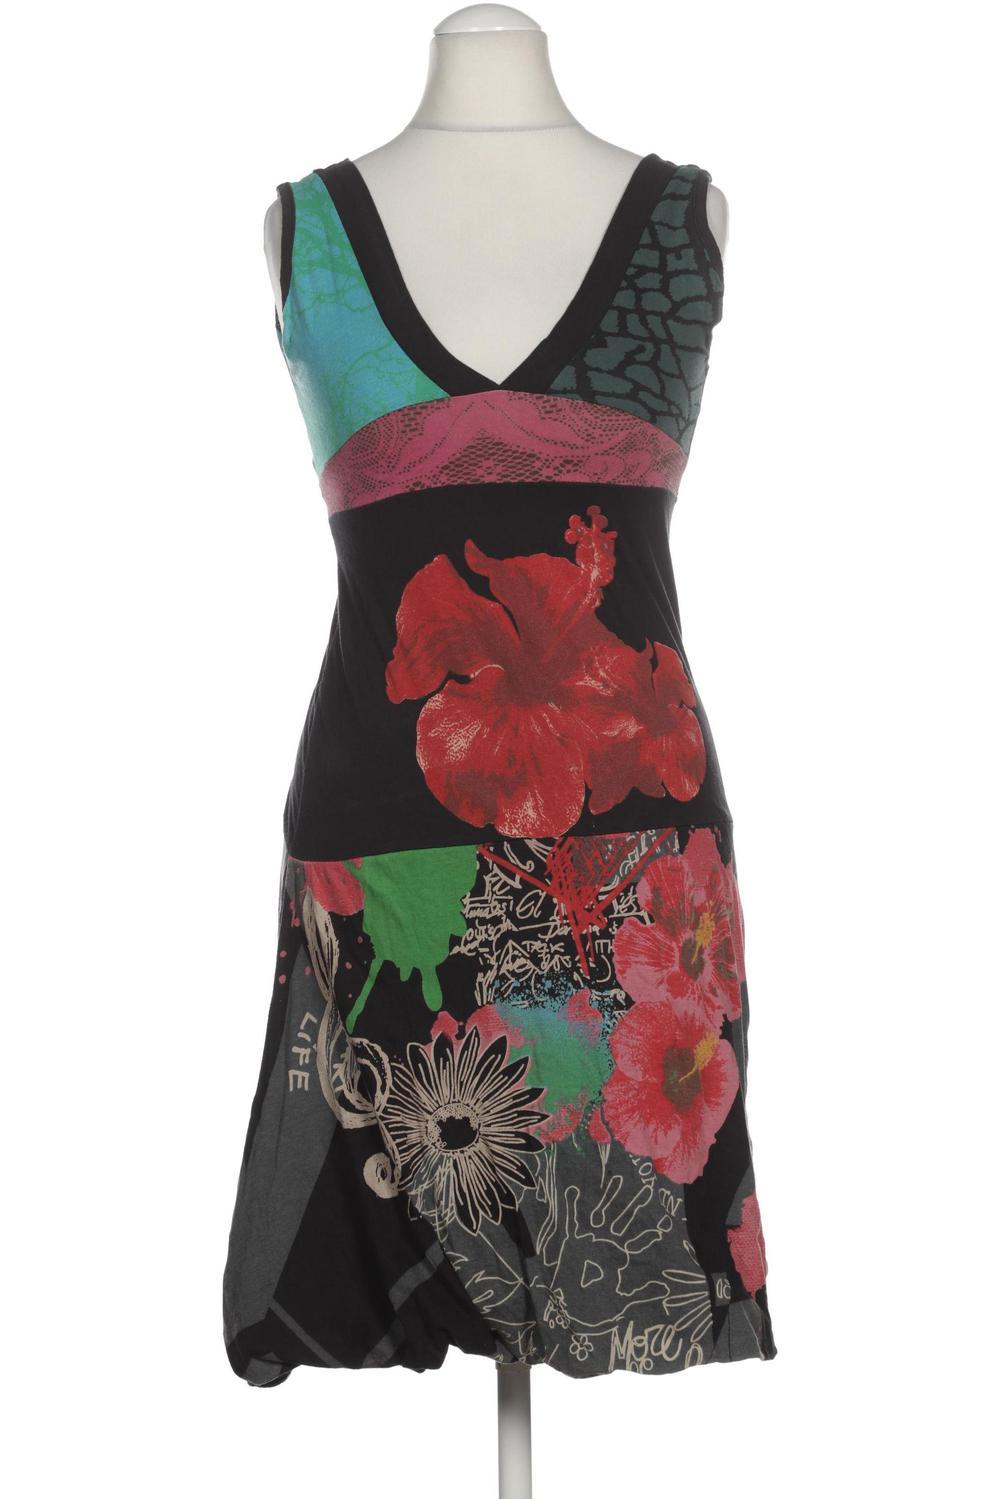 desigual kleid damen dress damenkleid gr. s baumwolle